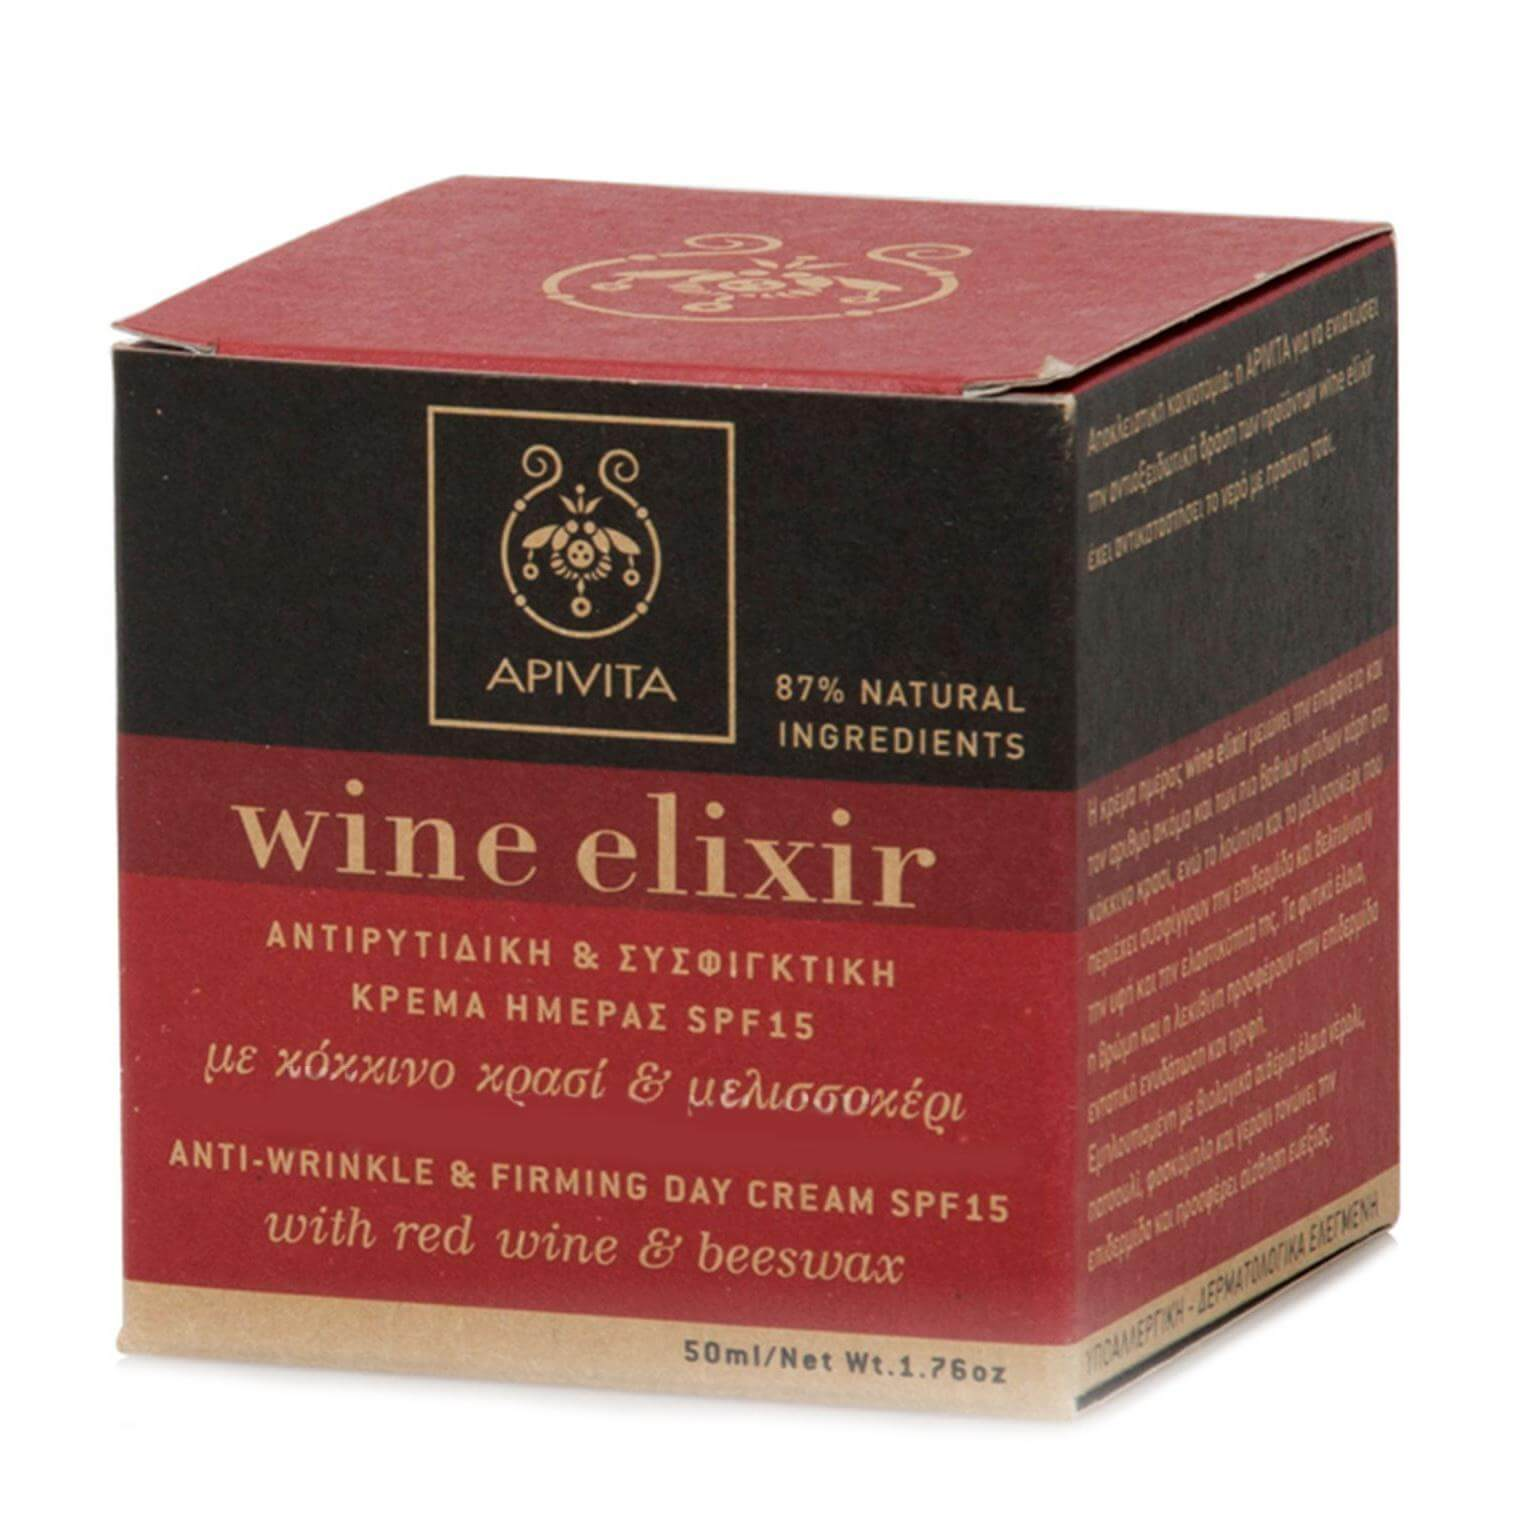 Apivita Wine Elixir Αντιρυτιδική και Συσφιγκτική Κρέμα Ημέρας Spf15 Με Κερί Μελισσών & Κόκκινο Κρασί 50ml